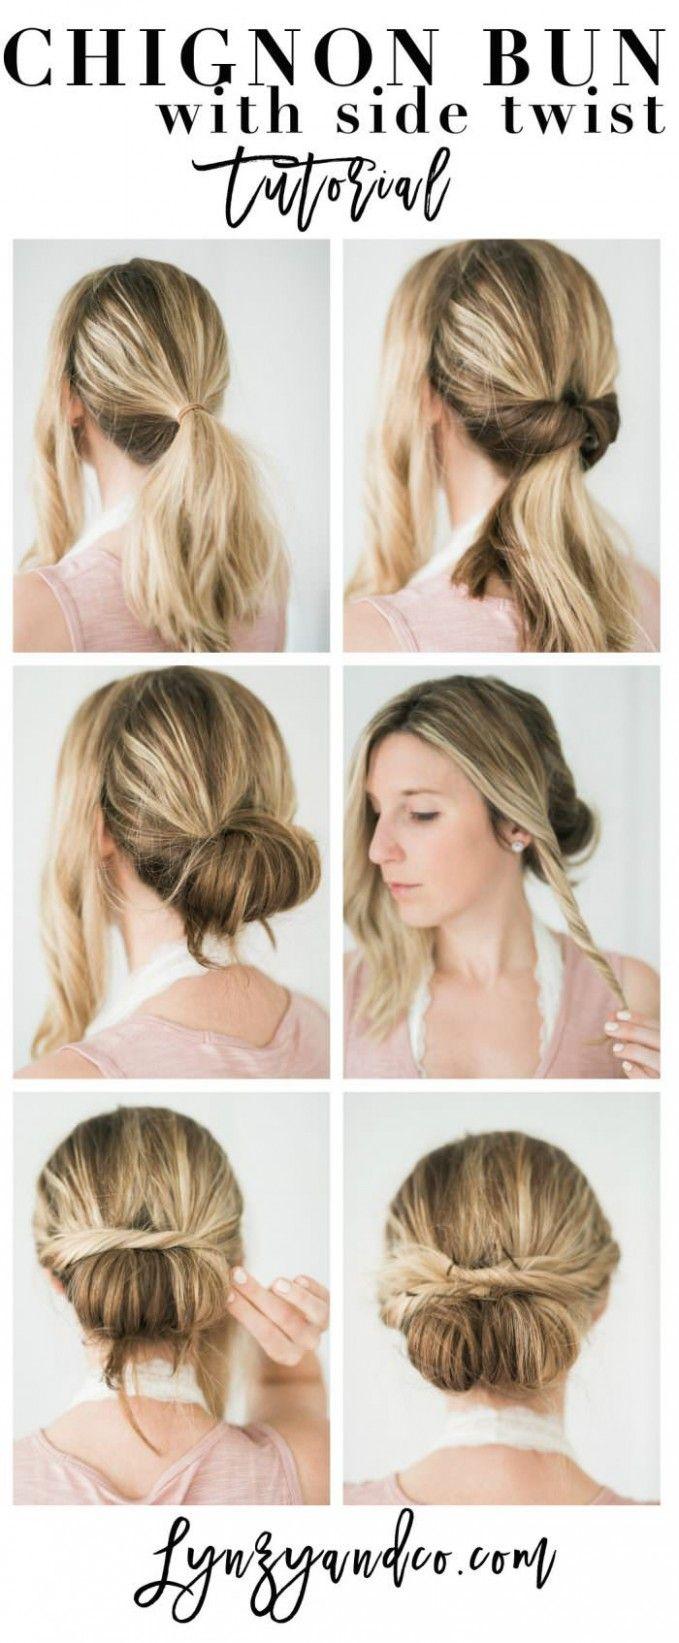 Easy Hairstyle Of Bun In 2020 Easy Chignon Hair Tutorials Easy Hair Tutorial